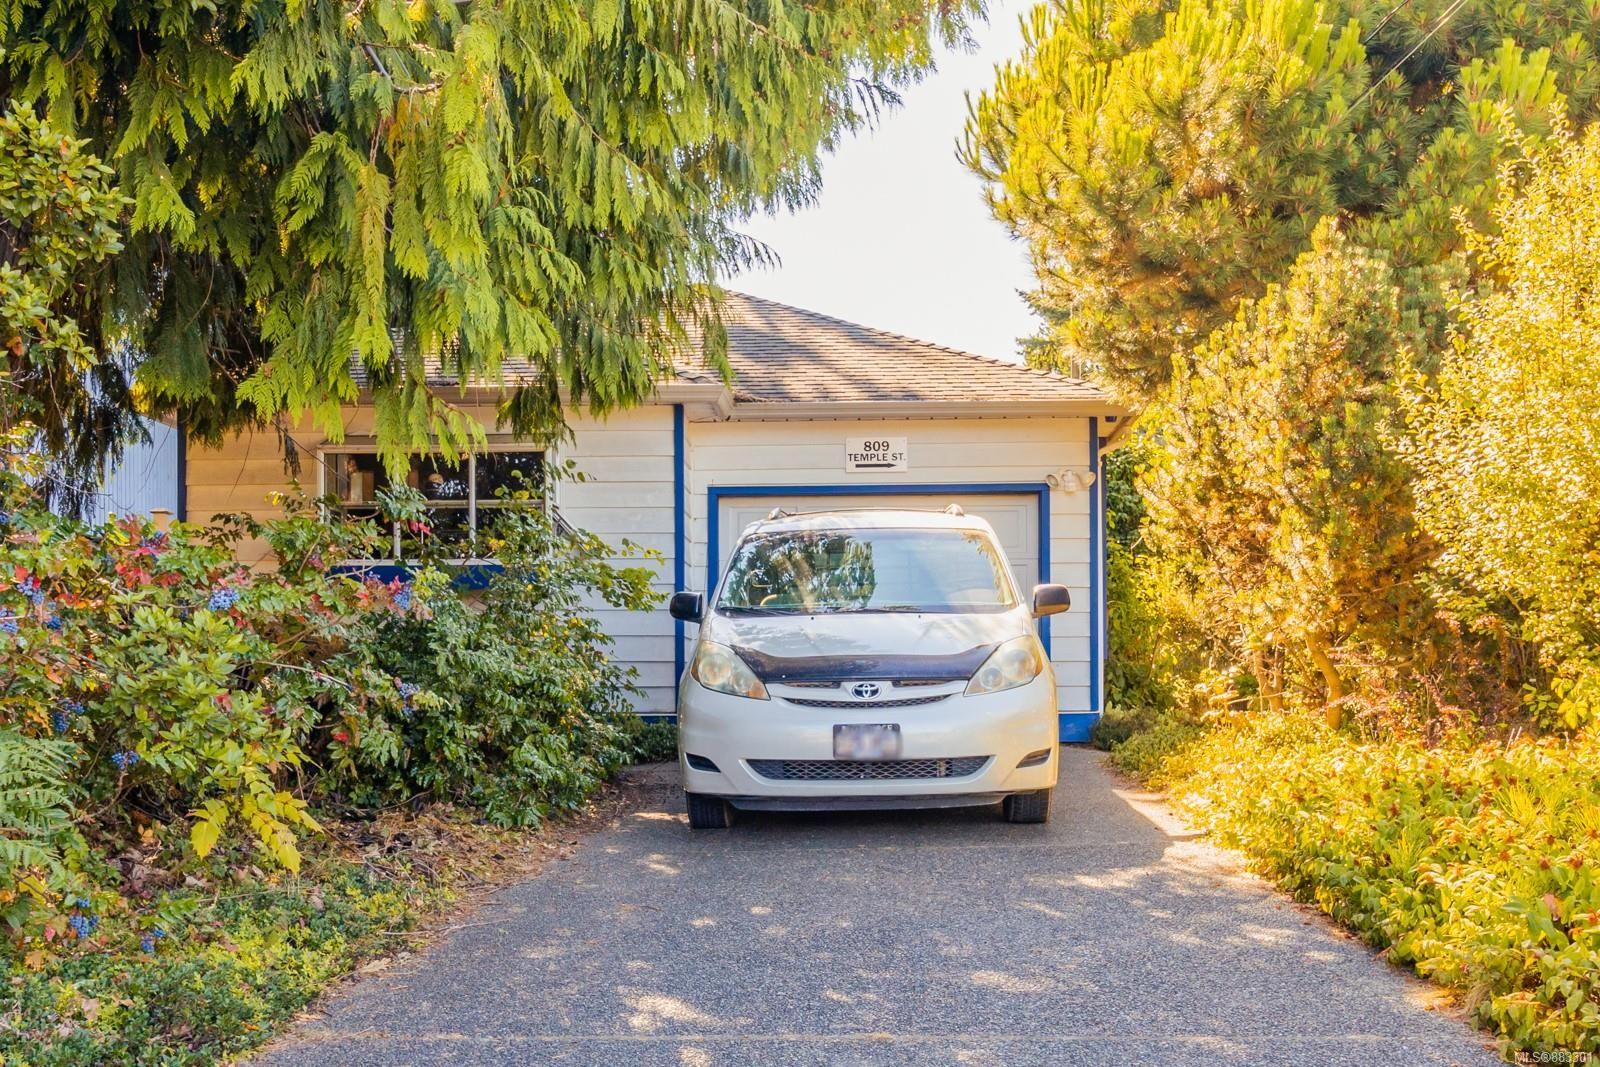 Main Photo: 809 Temple St in Parksville: PQ Parksville House for sale (Parksville/Qualicum)  : MLS®# 883301